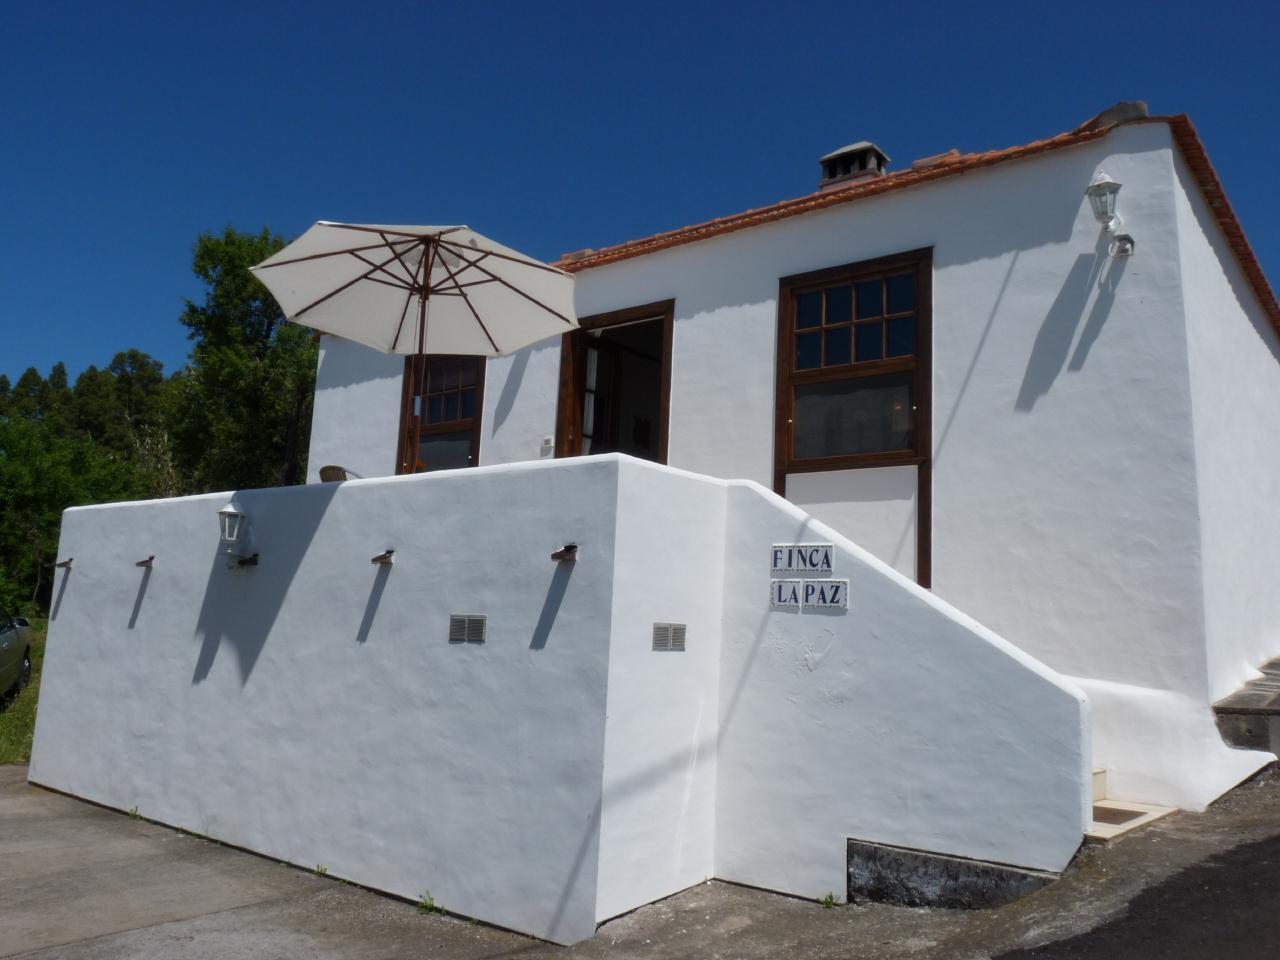 Ferienhaus FINCA TOPO DEL DRAGO (224349), Puntagorda, La Palma, Kanarische Inseln, Spanien, Bild 2